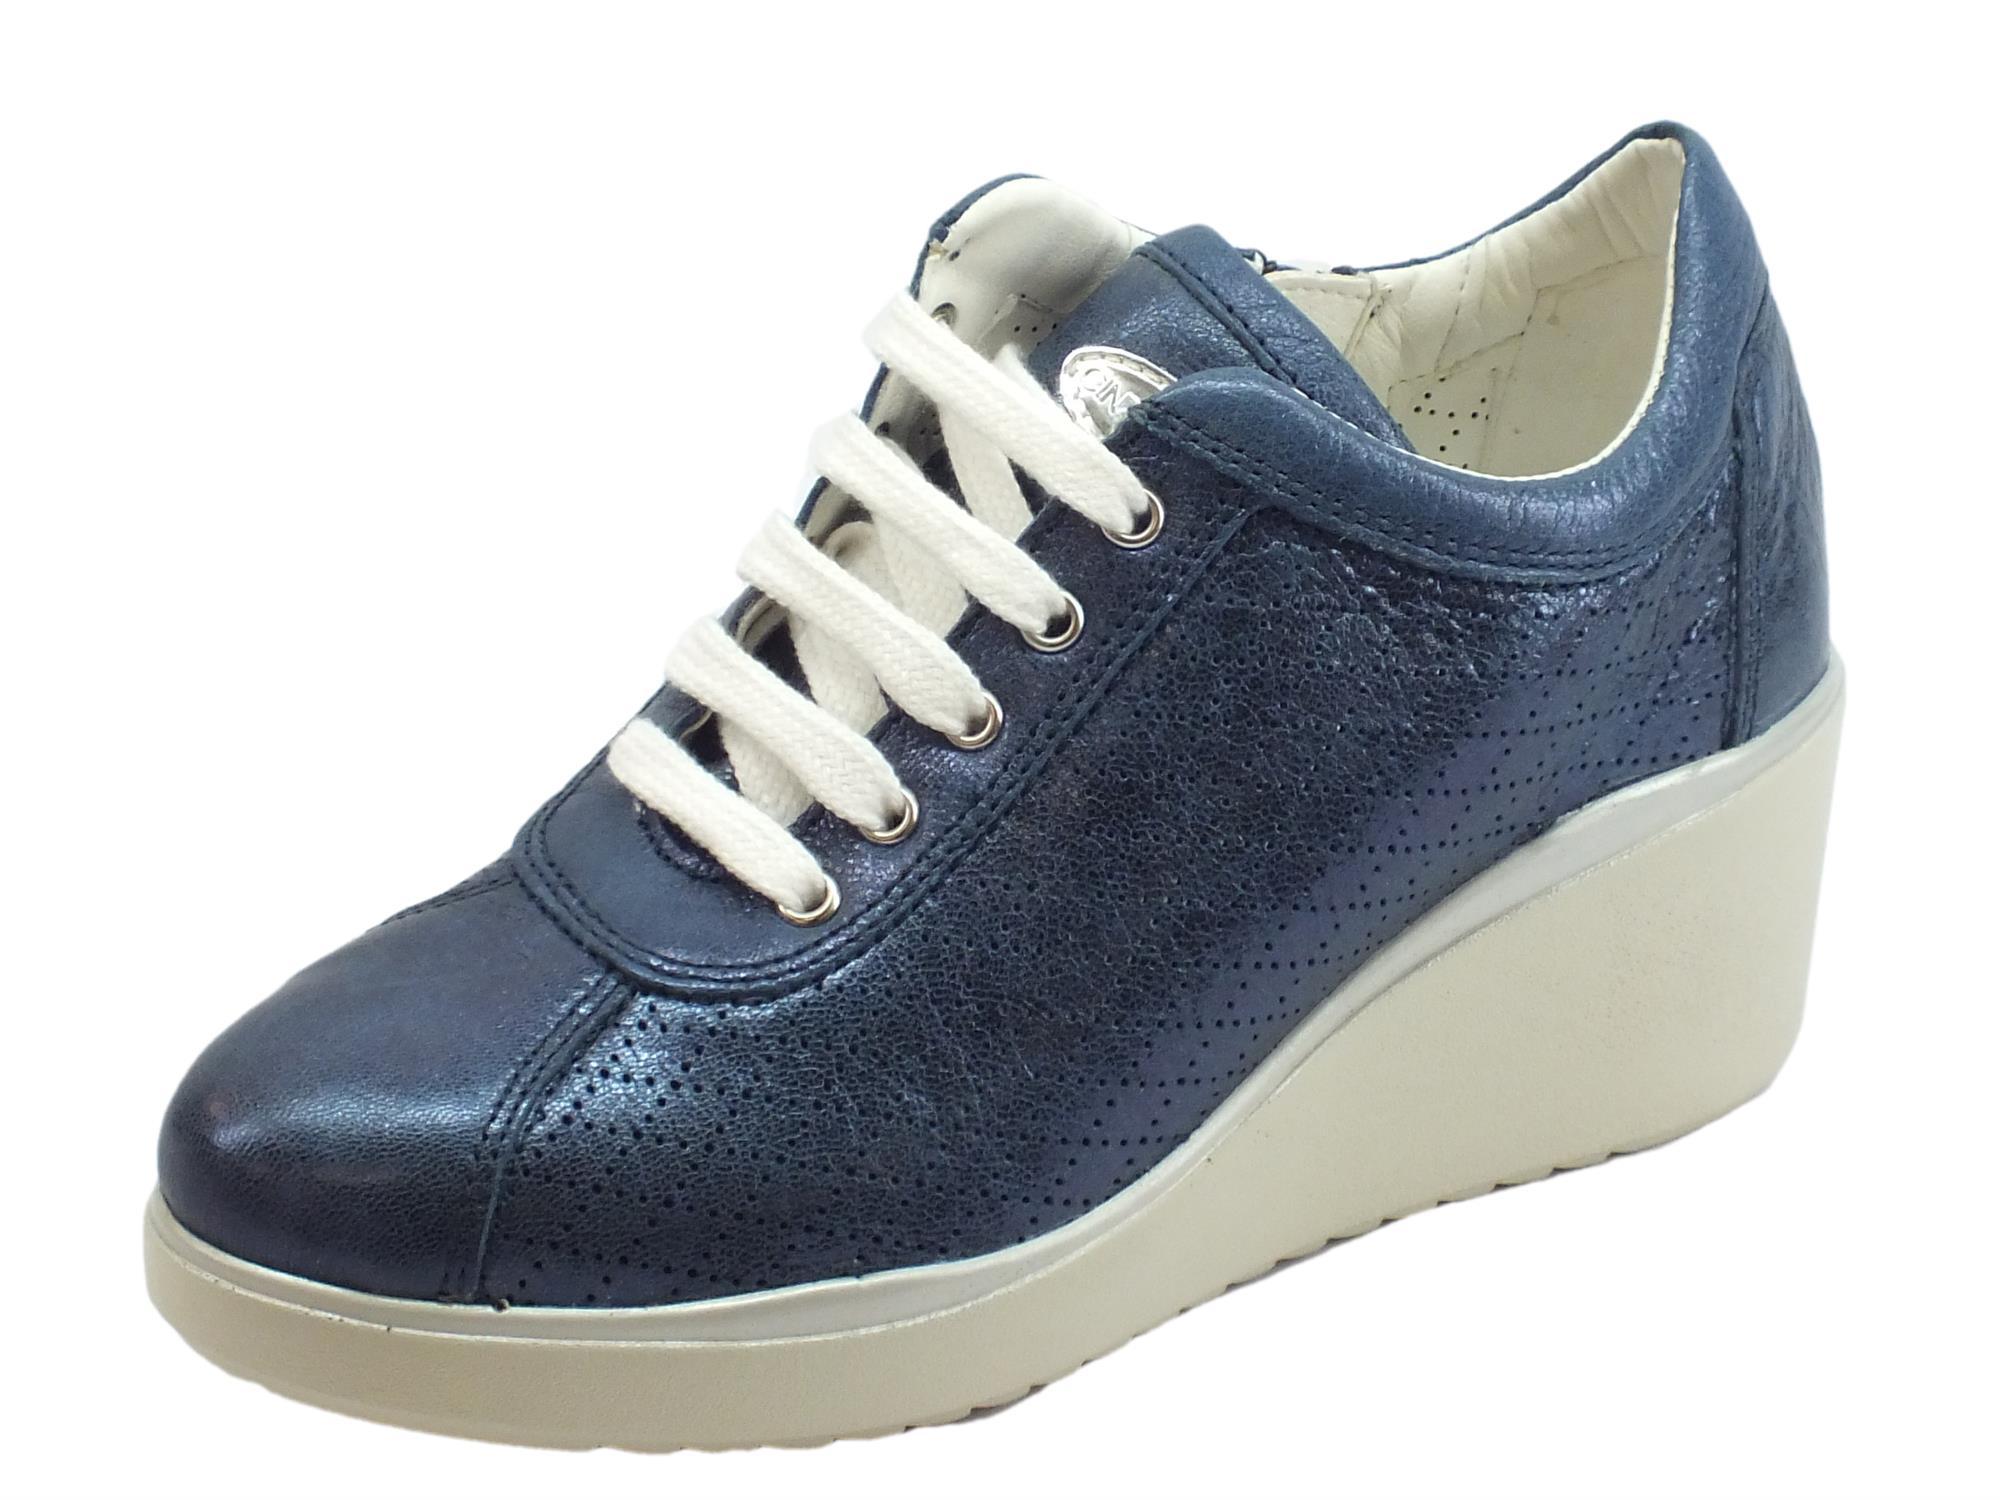 d52d0e93c0686c Cinzia Soft sneakers donna pelle blu notte zeppa alta - Vitiello ...